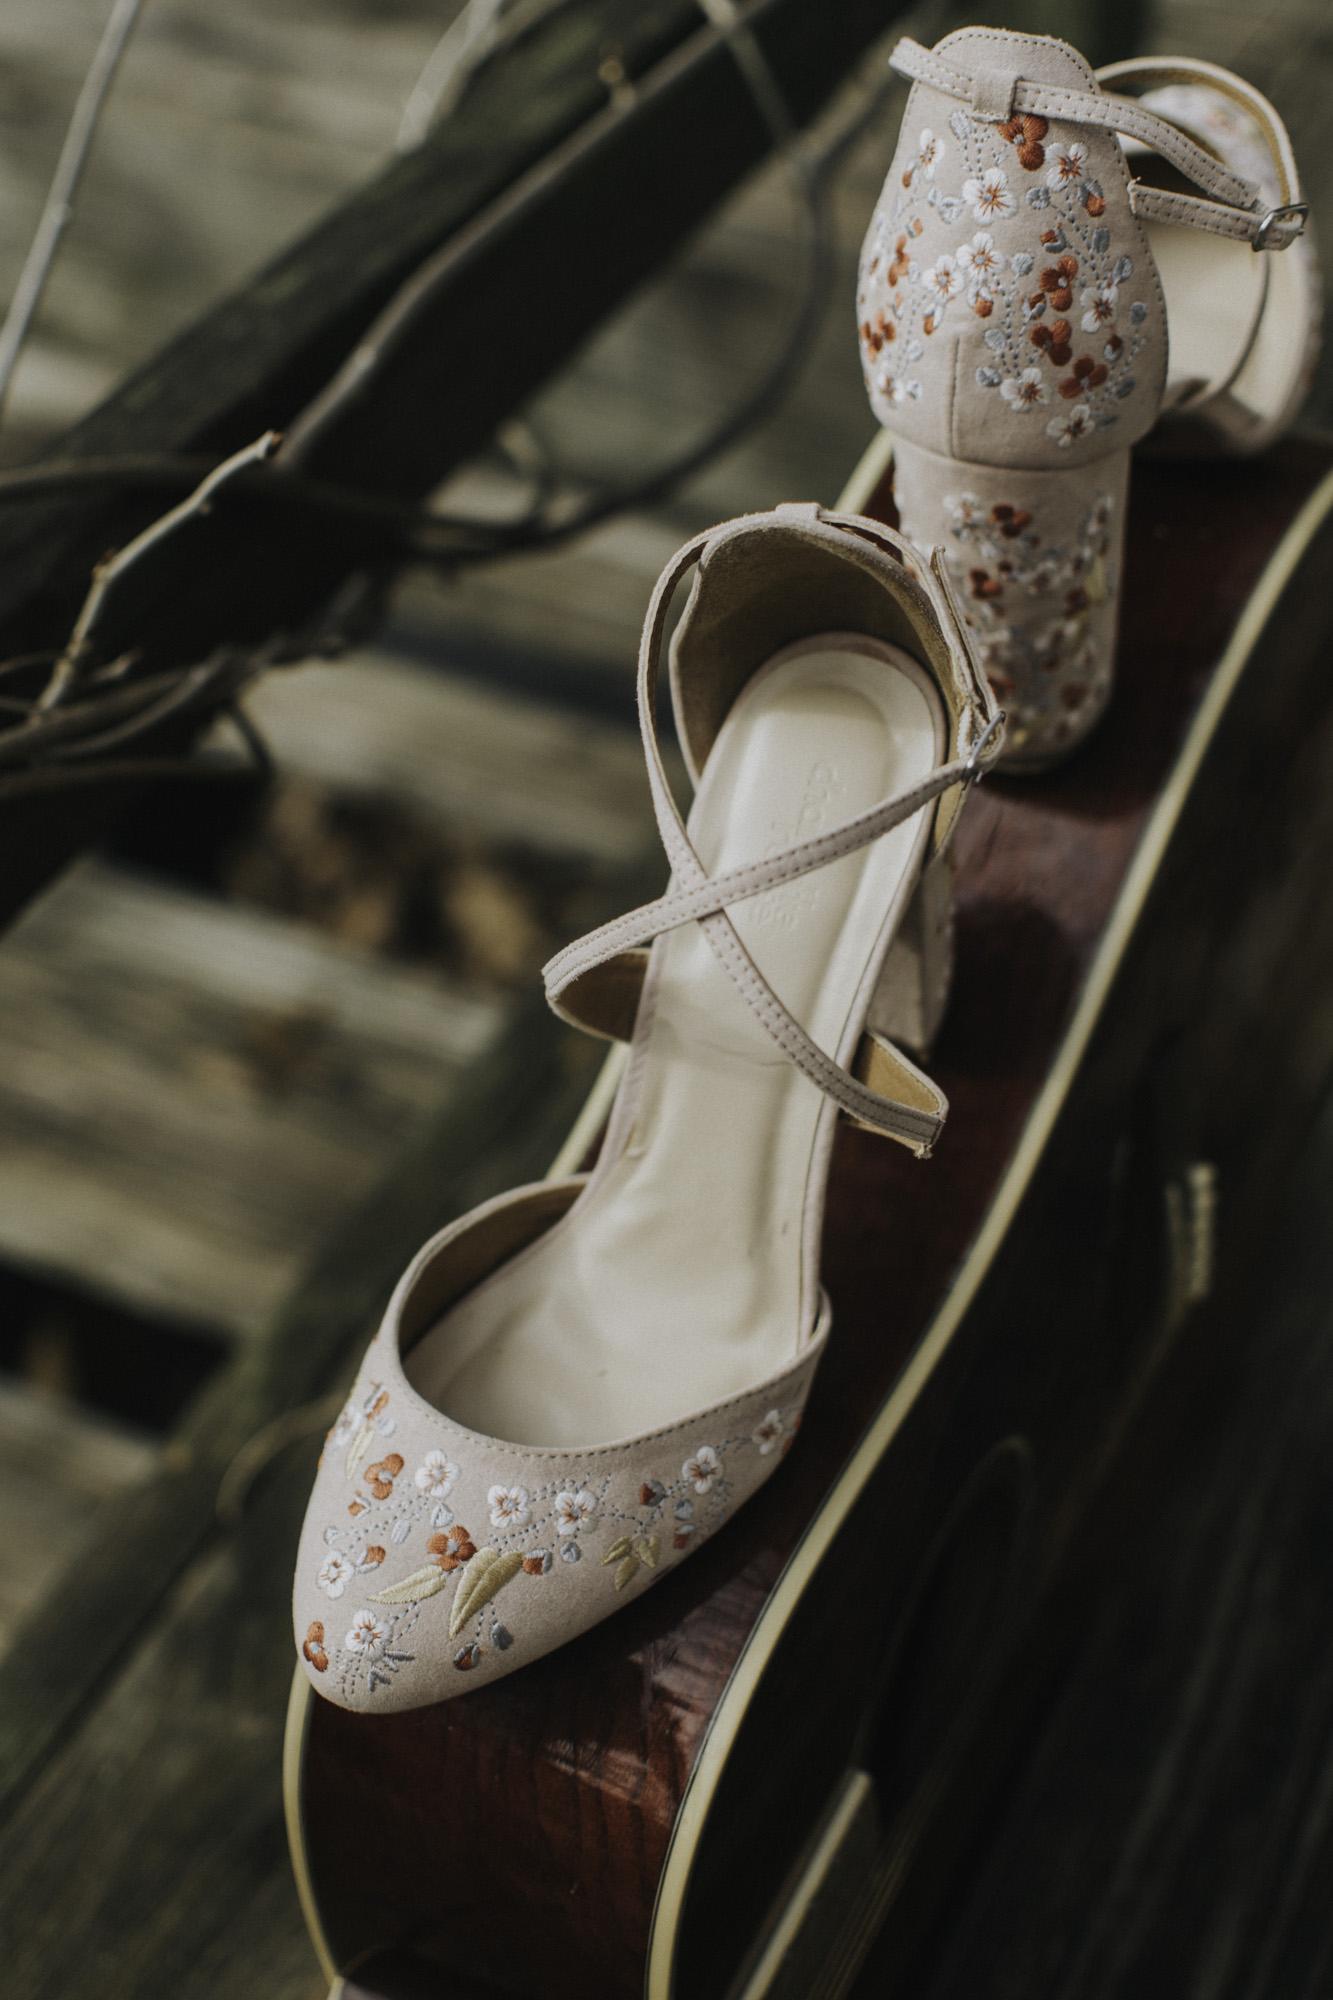 Cate_Ann_Photography_Dayton_Ohio_Wedding_Elopement_And_Engagement_PhotographerDSC_5651.jpg